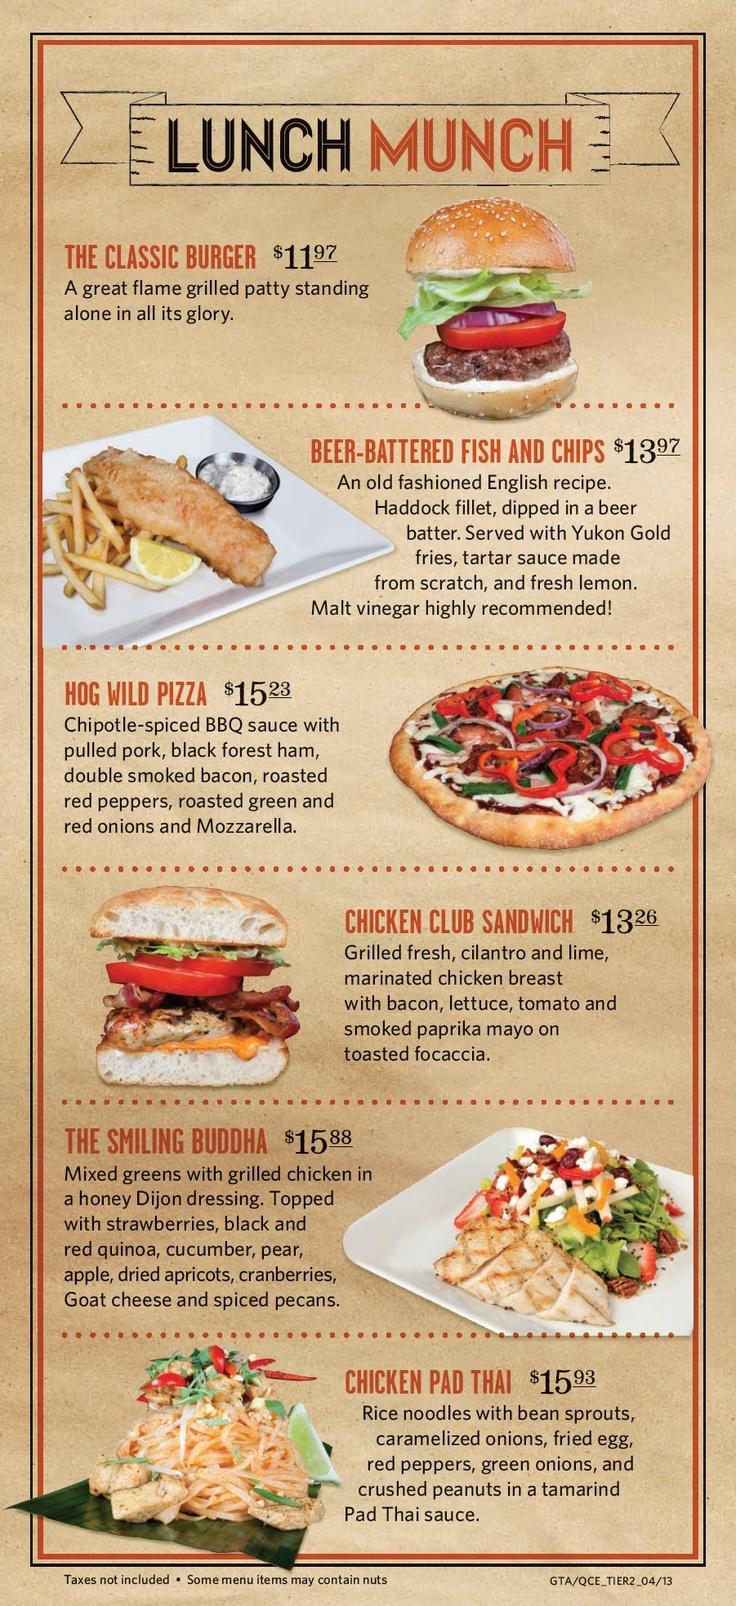 Jack Astor's lunch menu #2